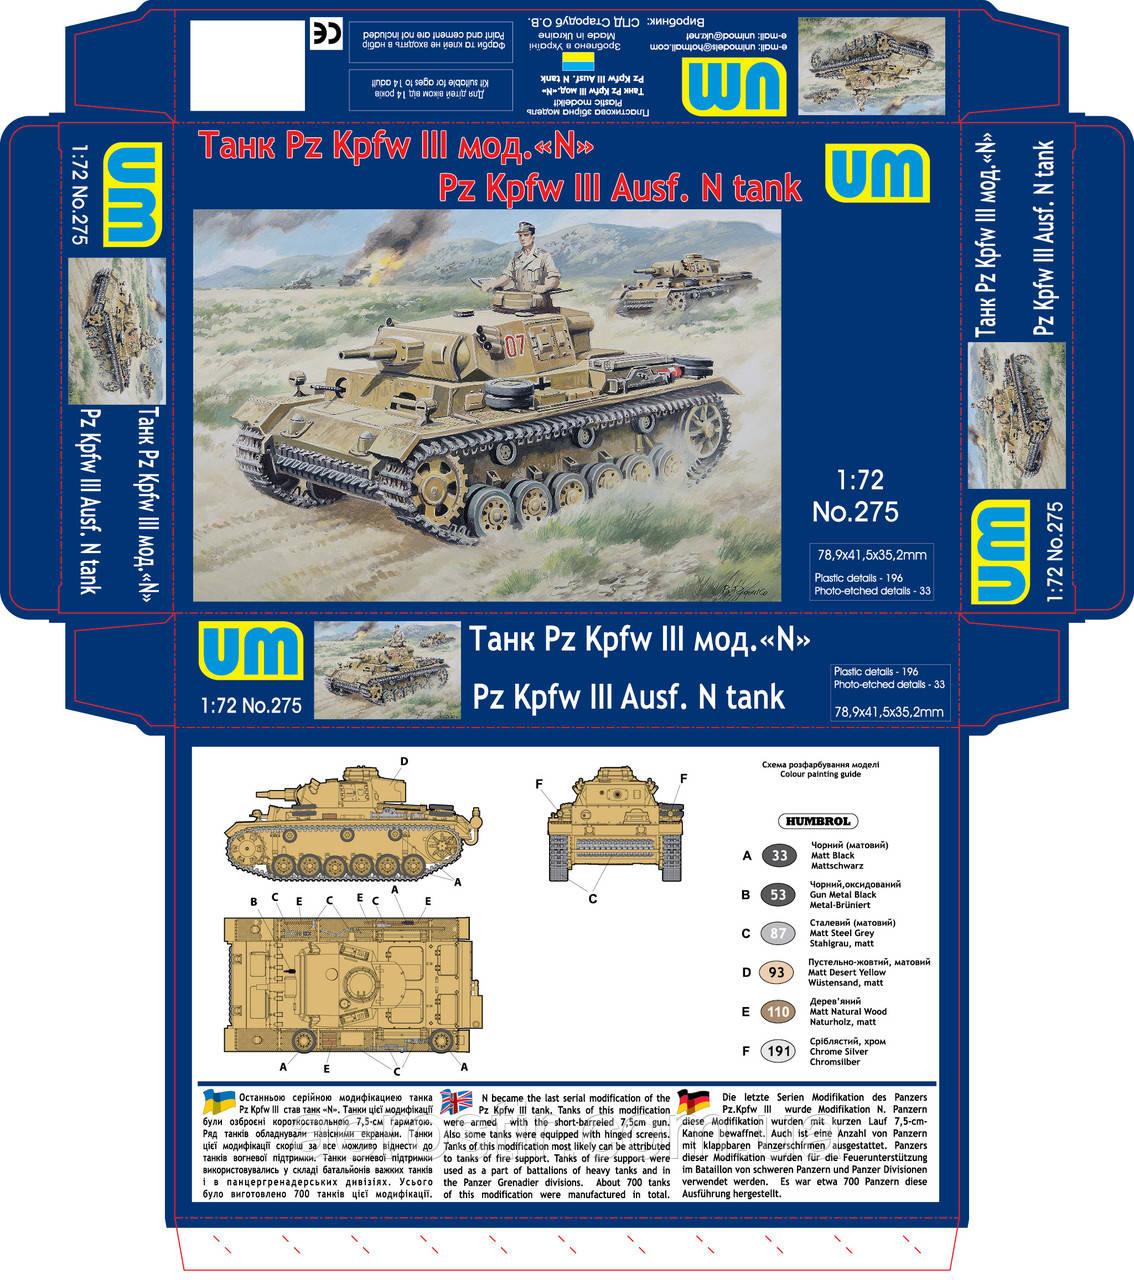 Pz Kpfw III Ausf. N 1/72 UM 275